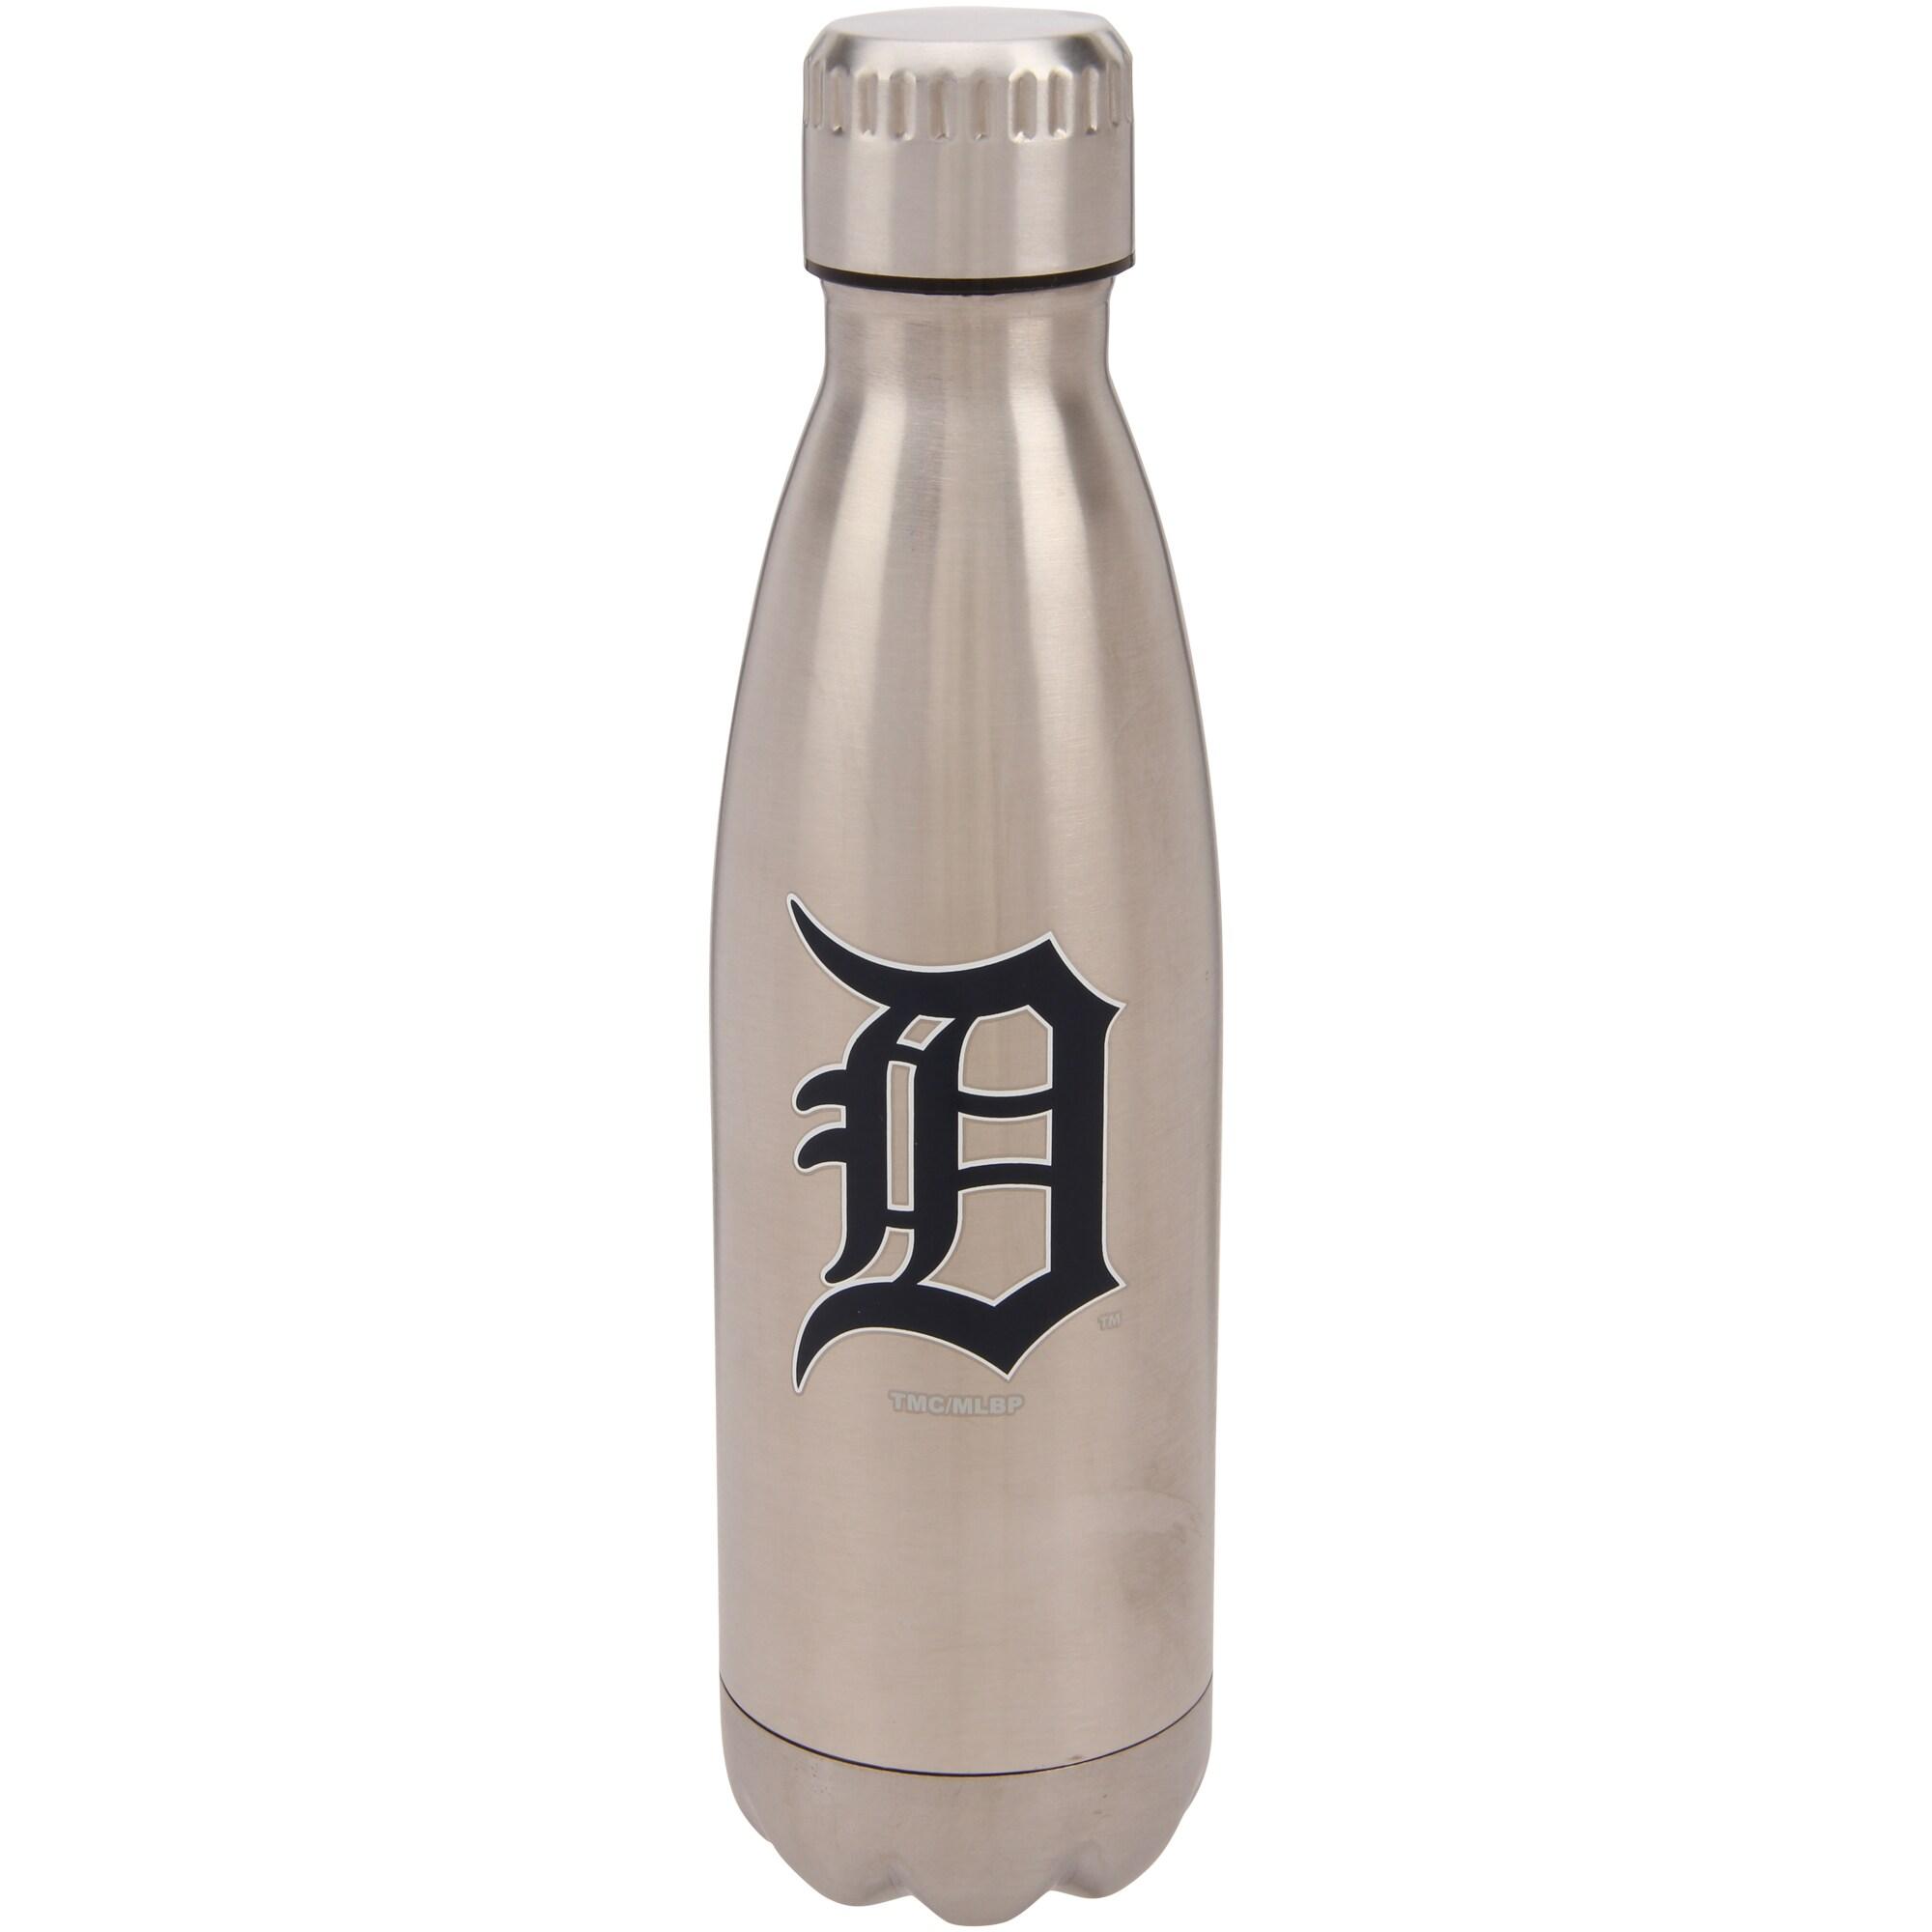 Detroit Tigers 16oz. Stainless Steel Water Bottle